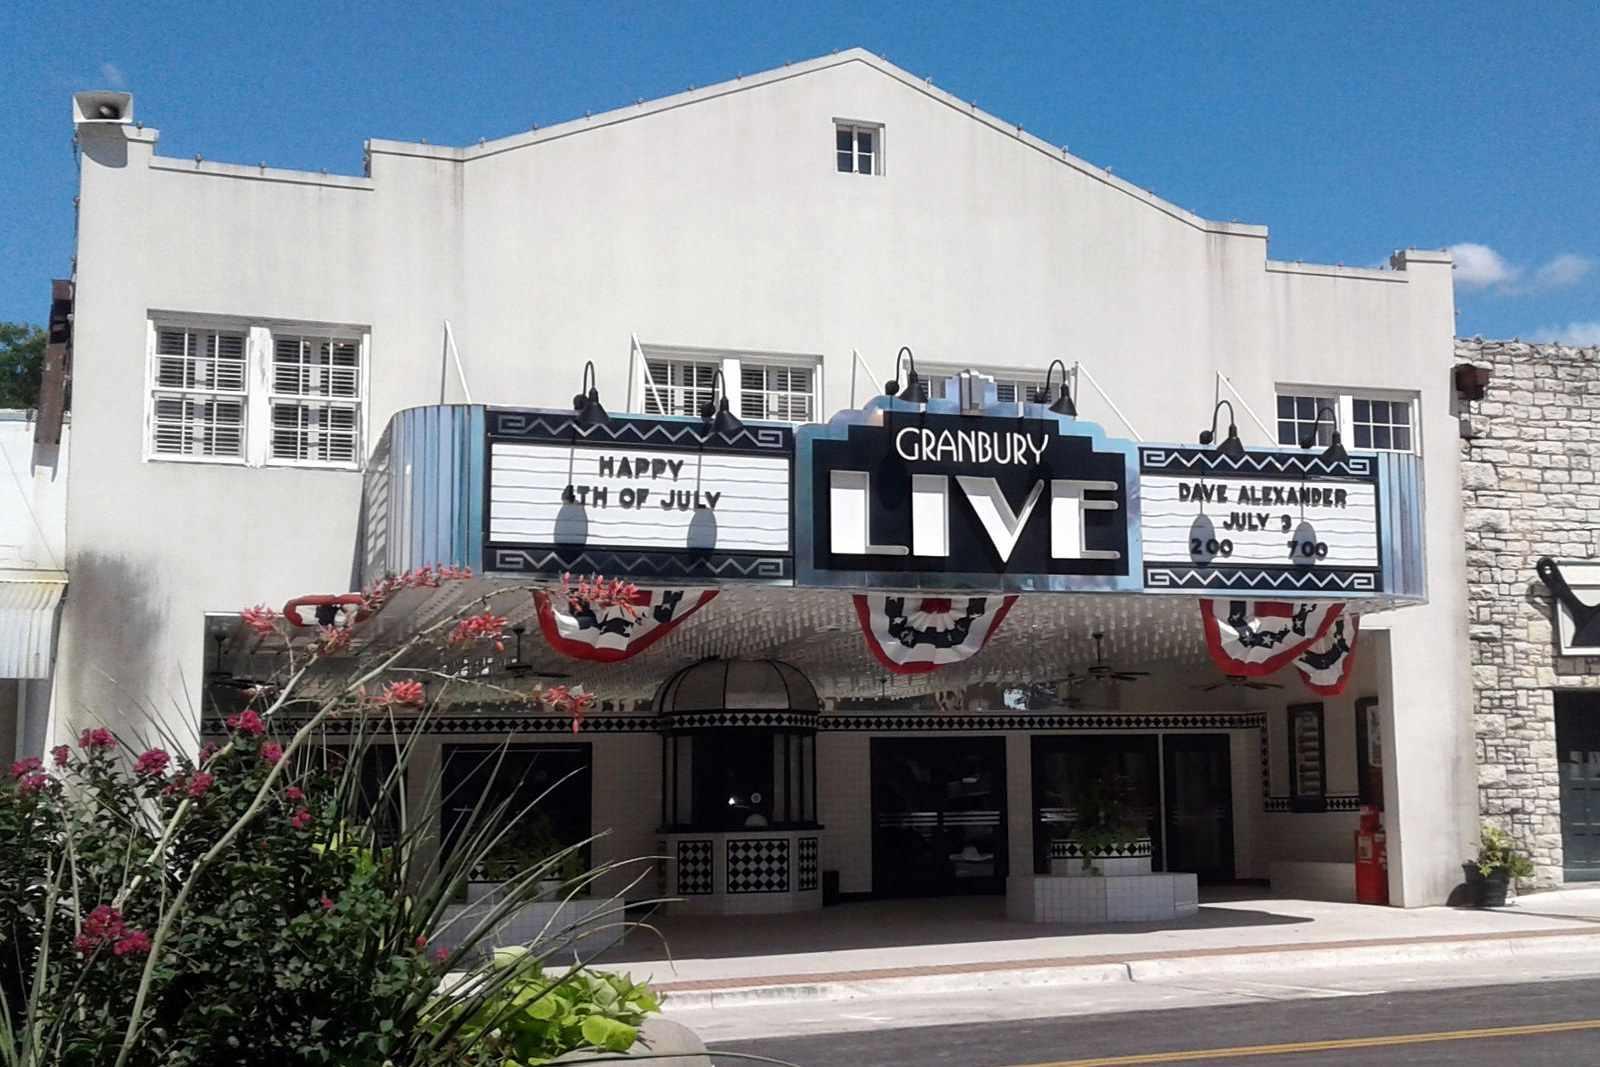 Granbury Texas theater